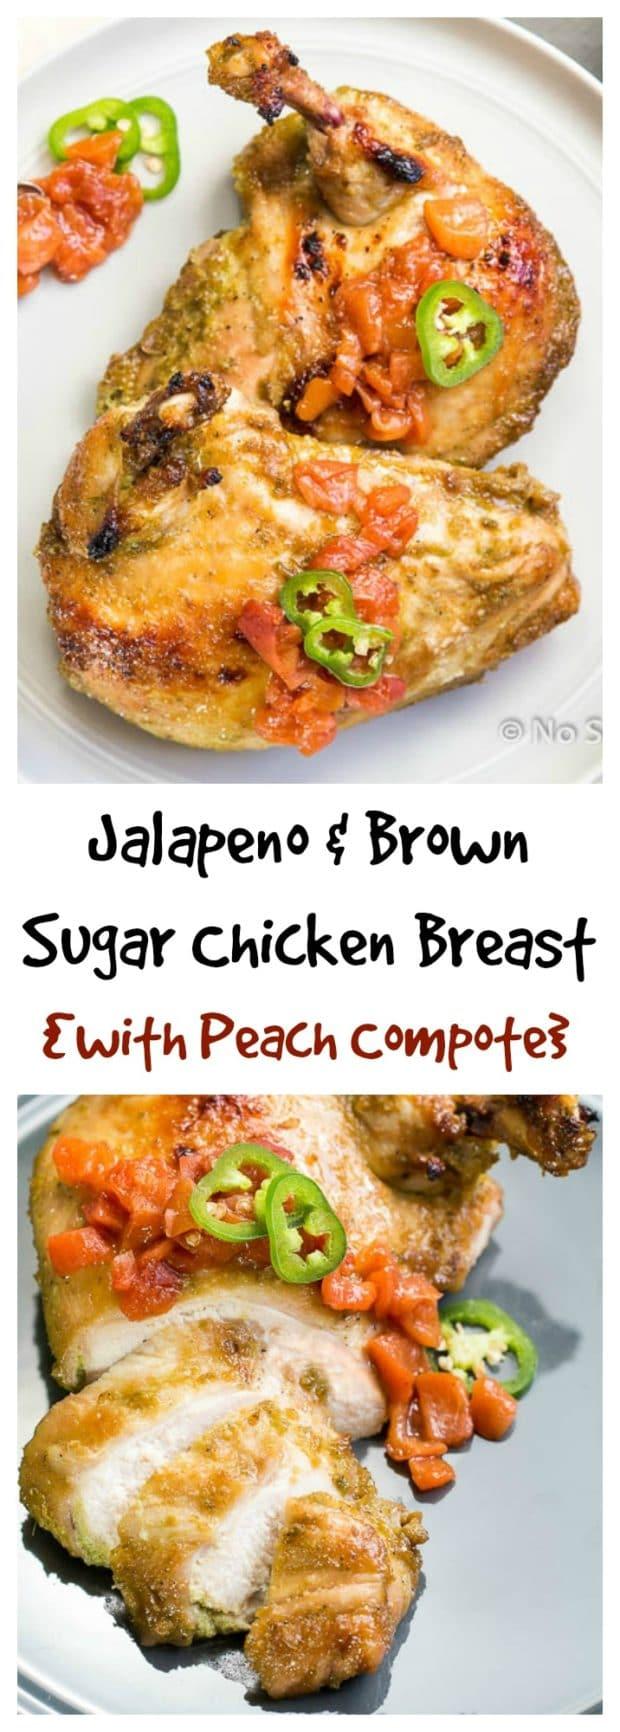 Jalapeno & Brown Sugar Chicken